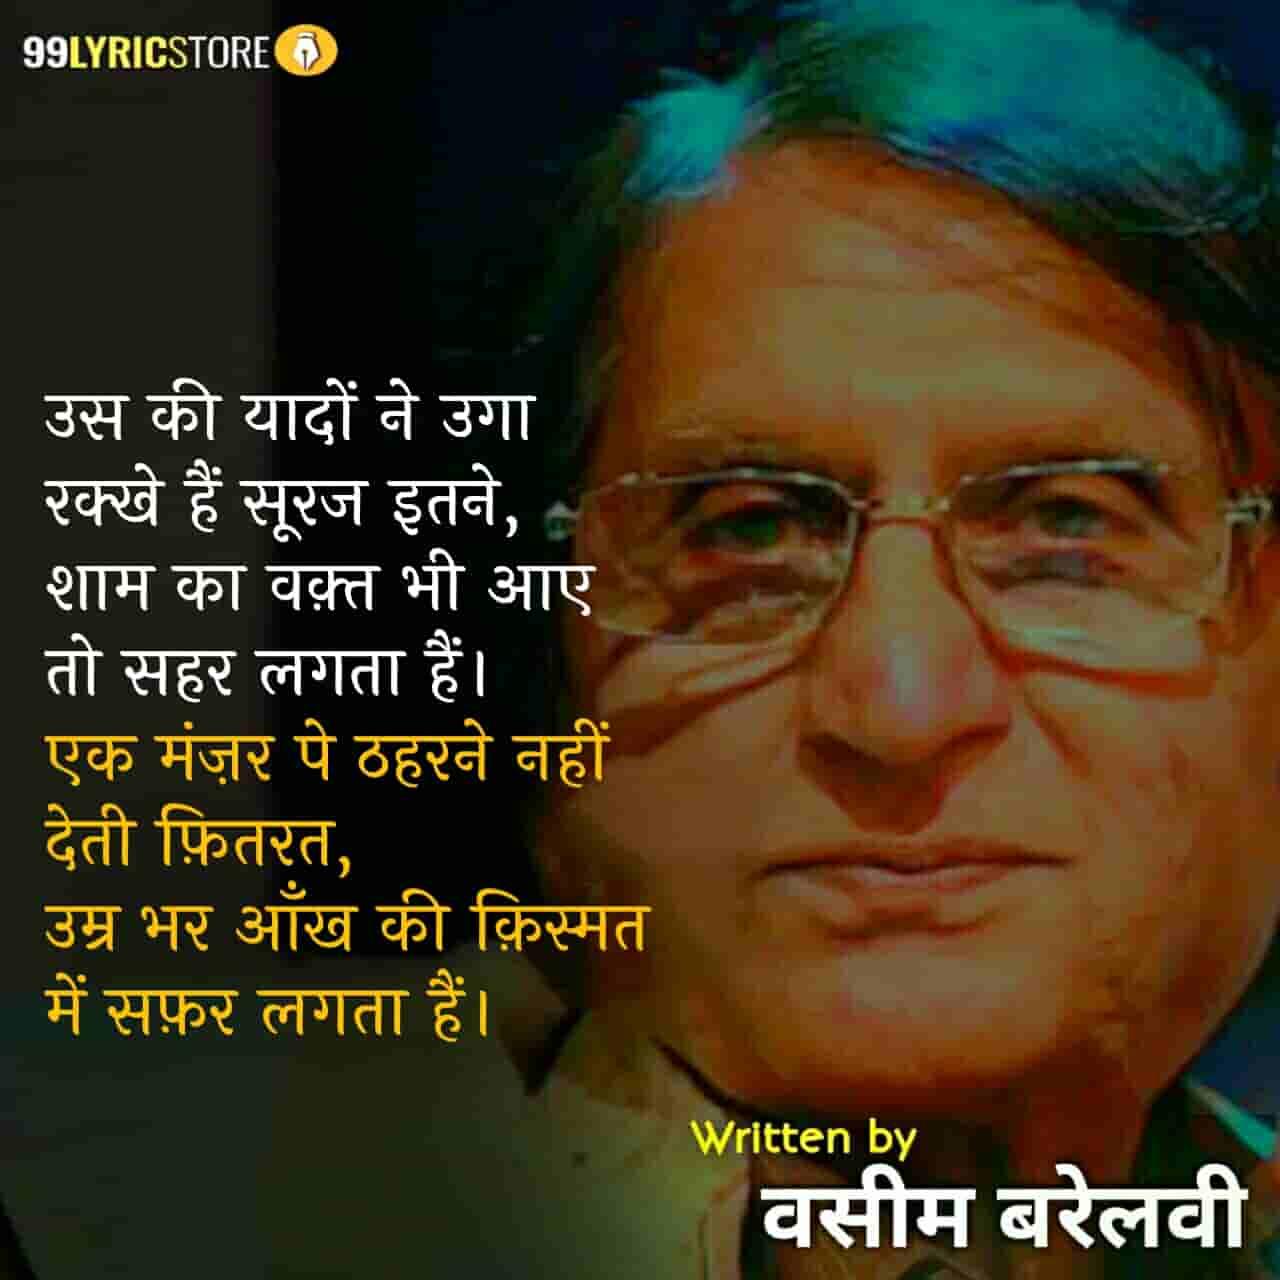 This beautiful Ghazal 'Chaand Ka Khwab Ujalon Ki Nazar Lagta Hain' has written by Waseem Barelvi.